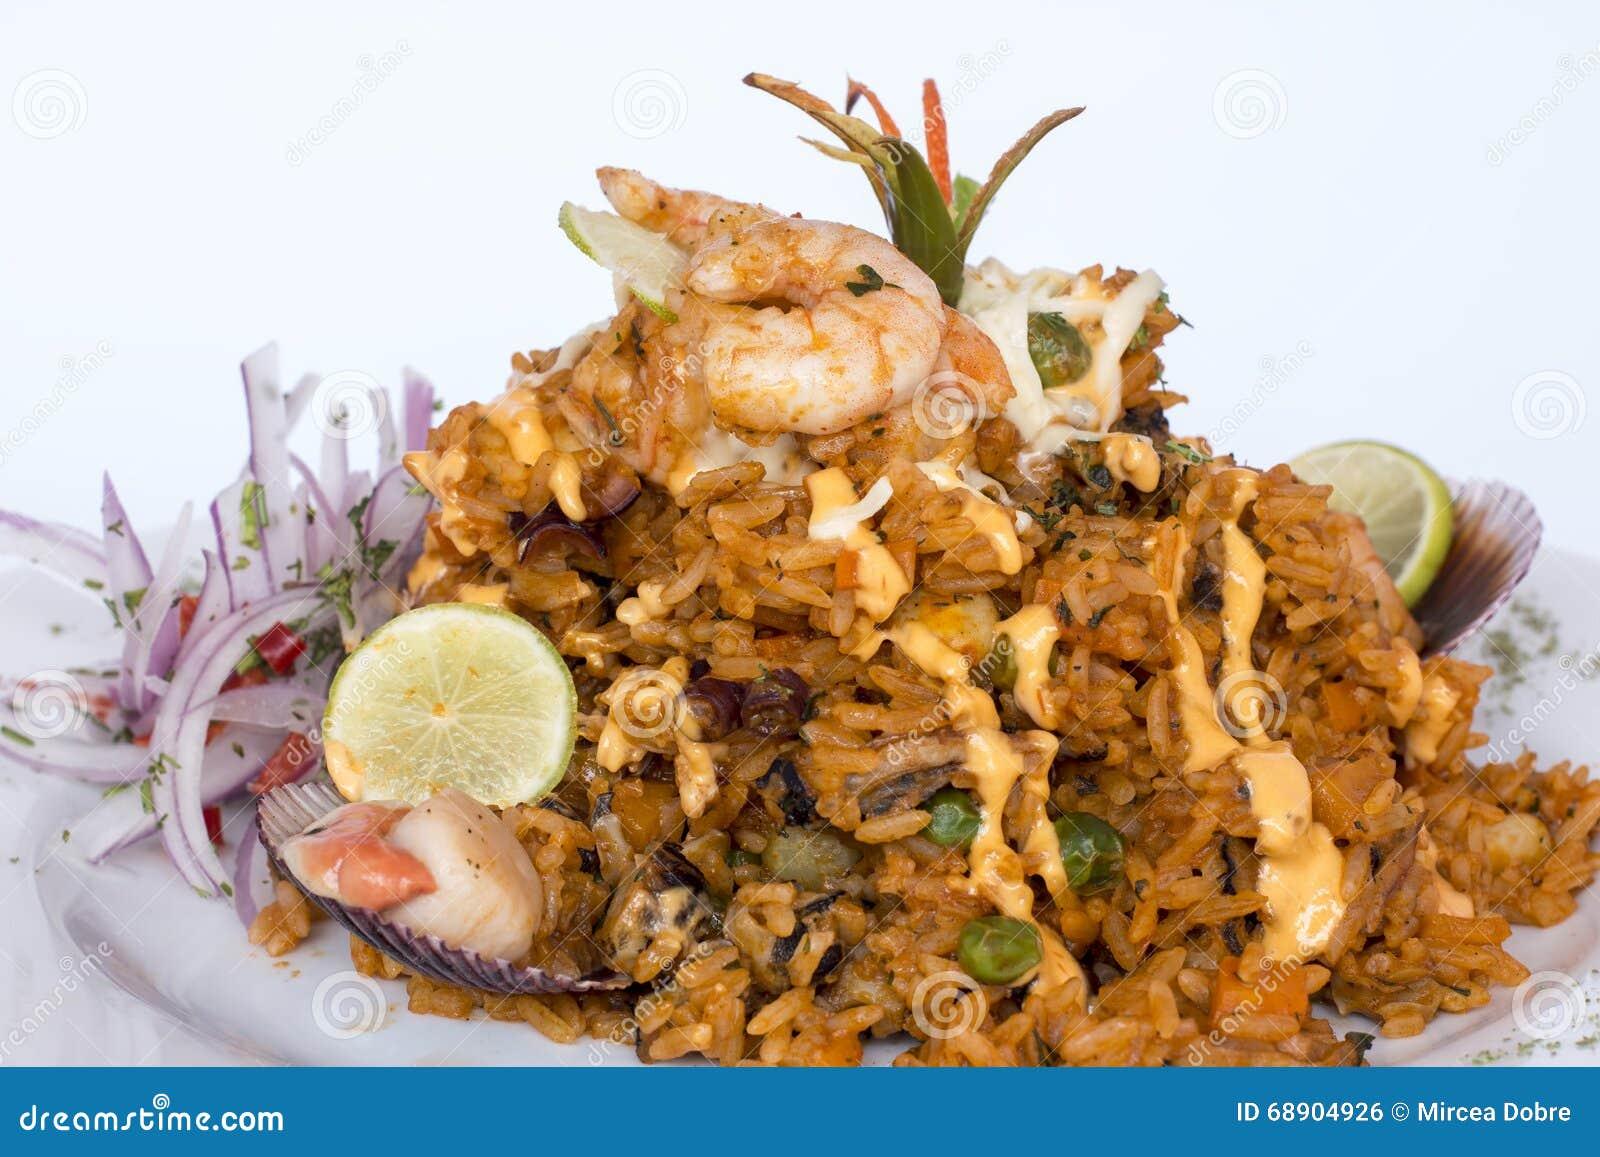 Peru Dish : Riz avec des fruits de mer (escroquerie Mariscos d Arroz)